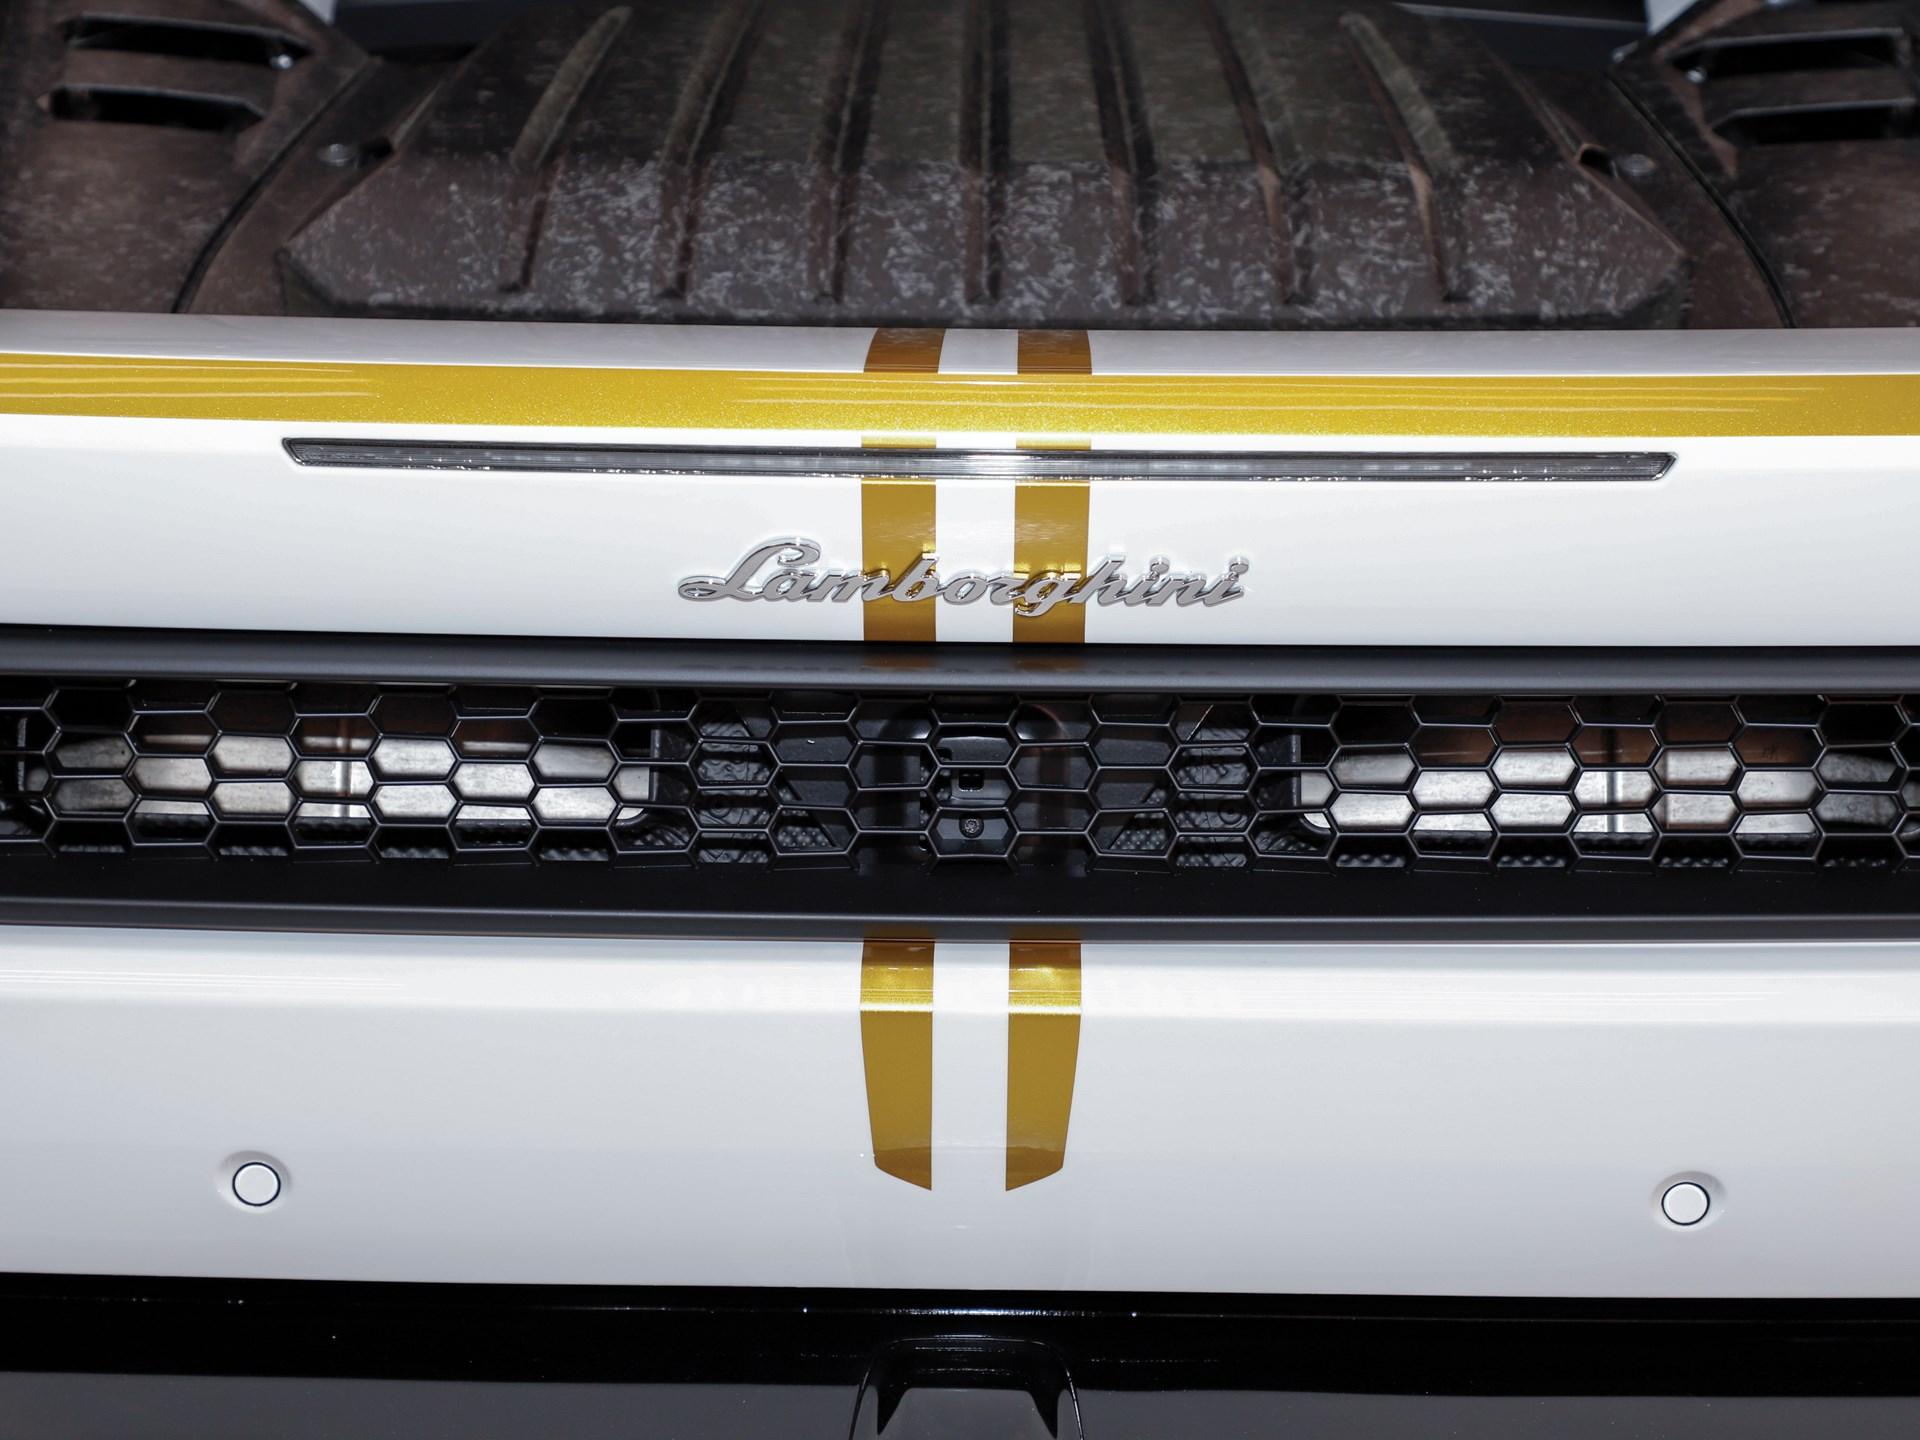 2018 Lamborghini Huracán RWD Coupé